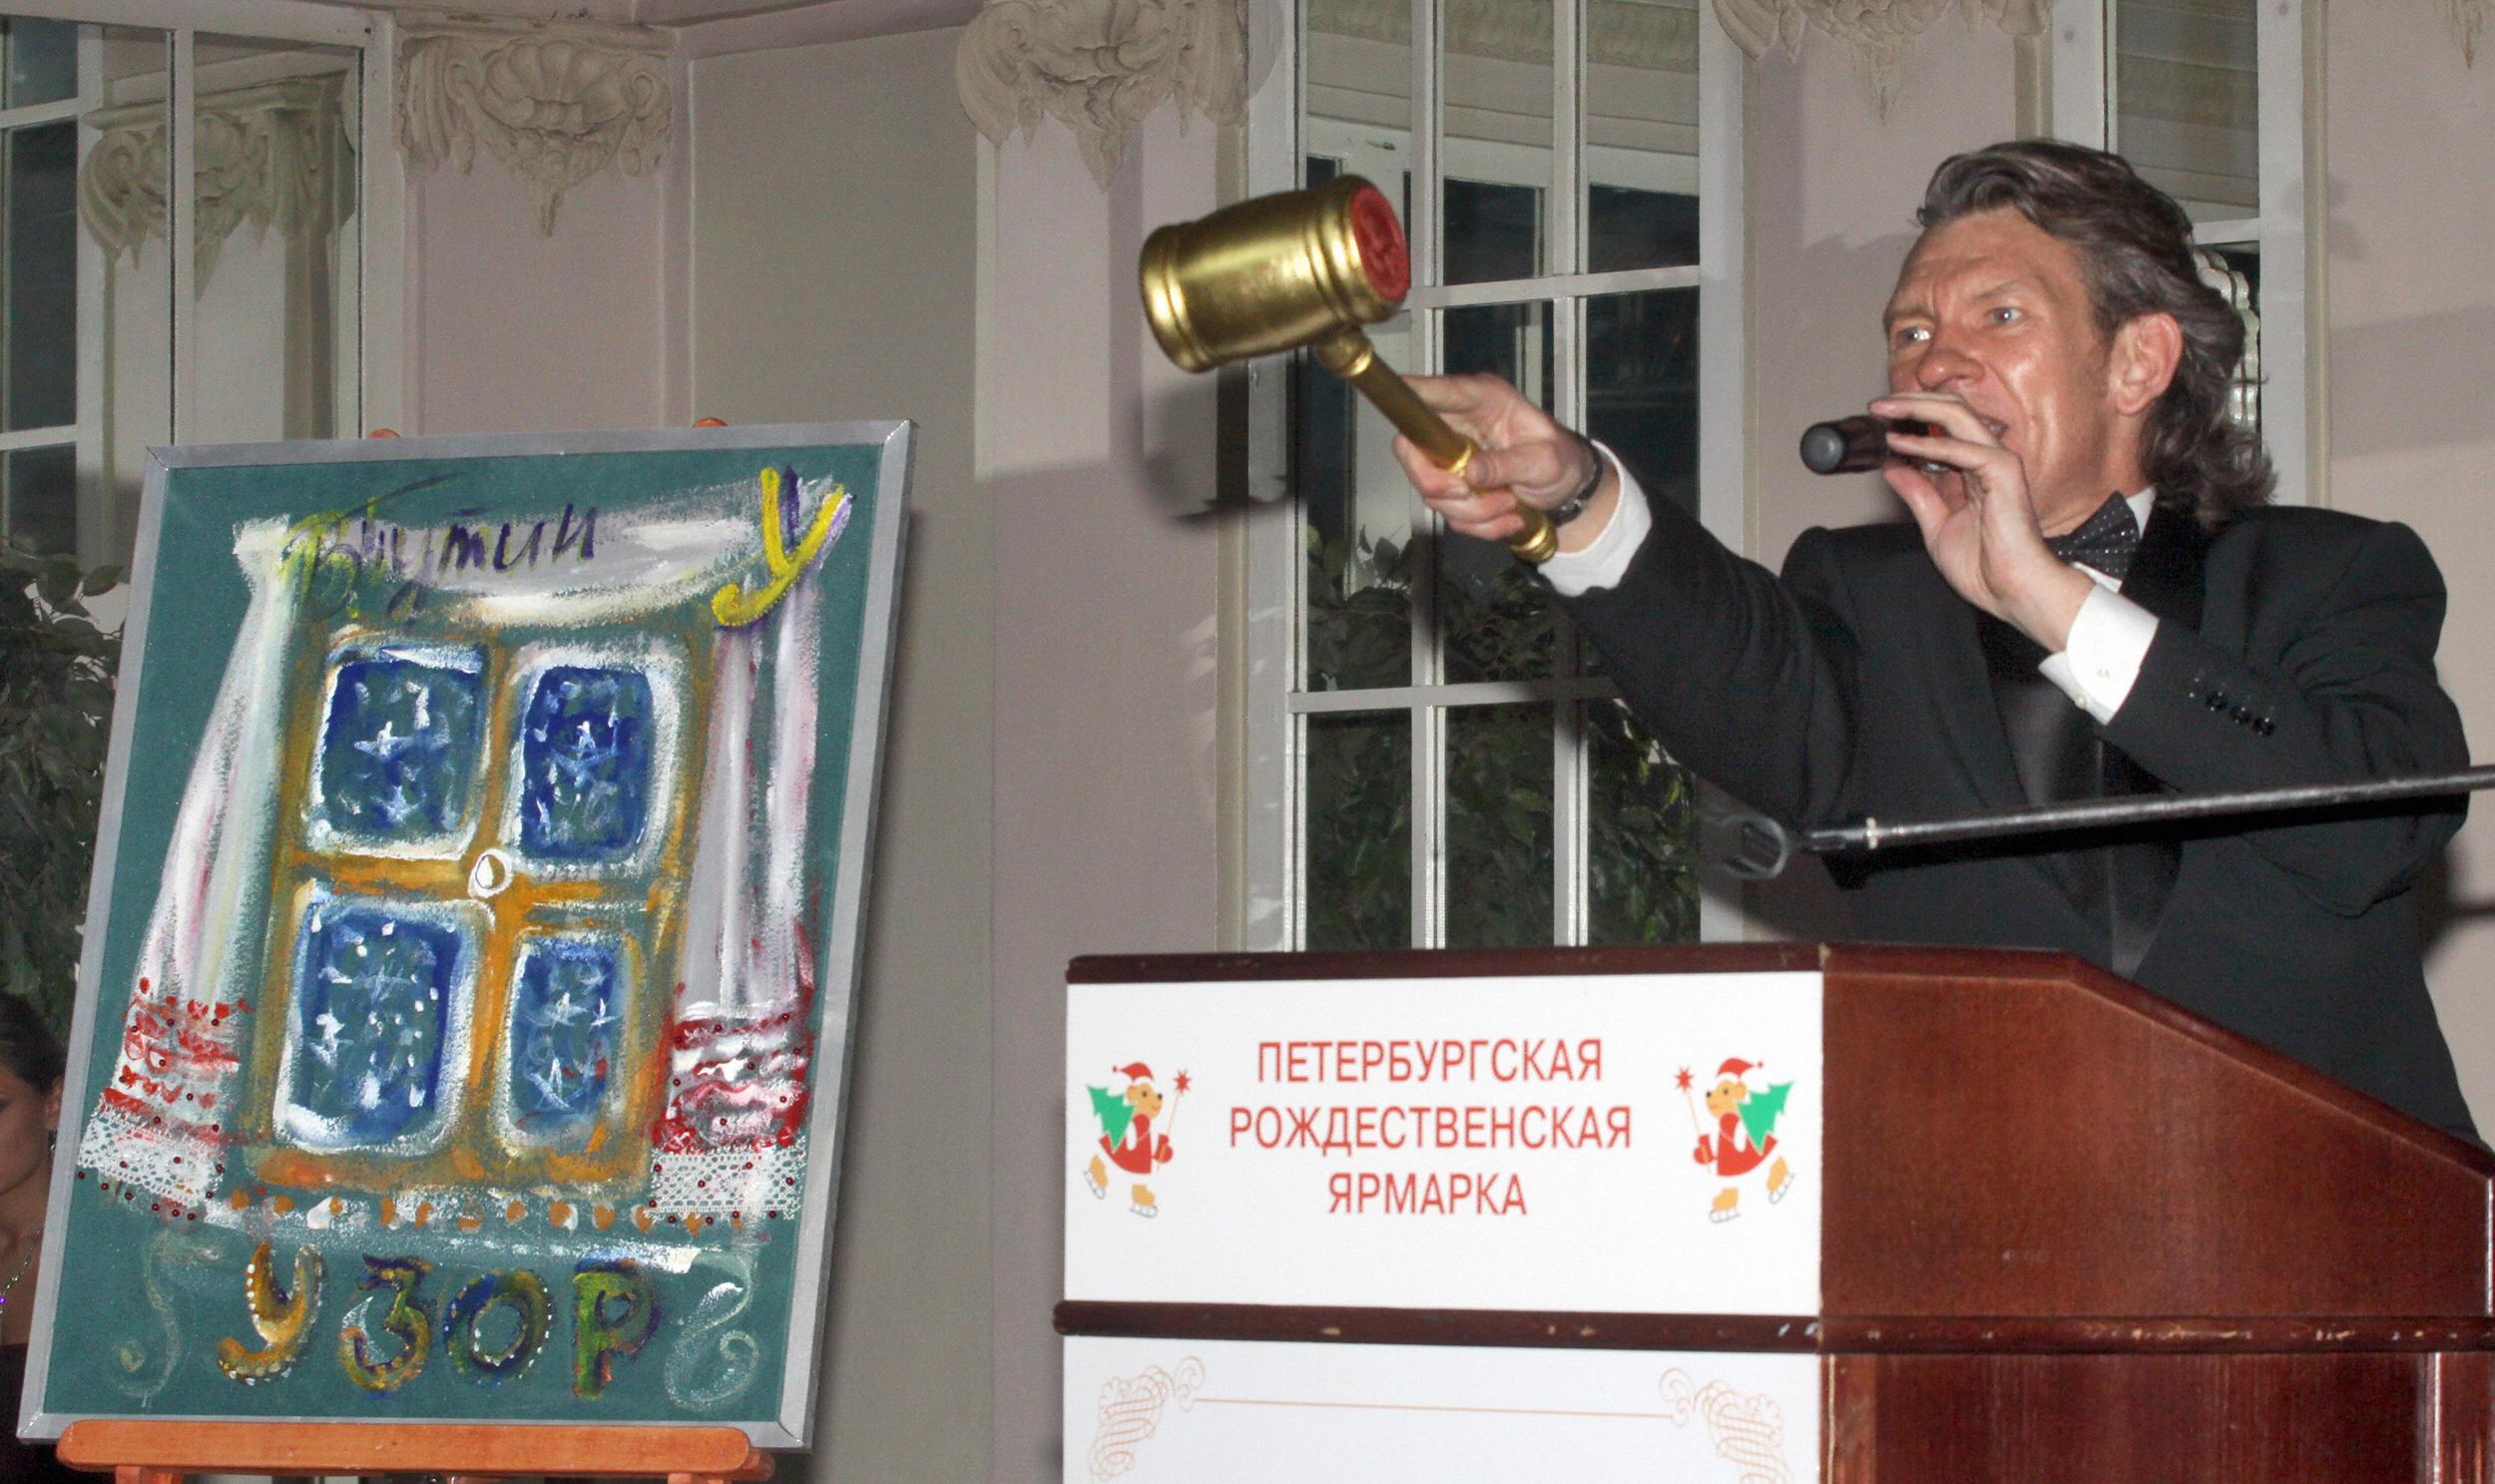 Vladimir Putin painting auction